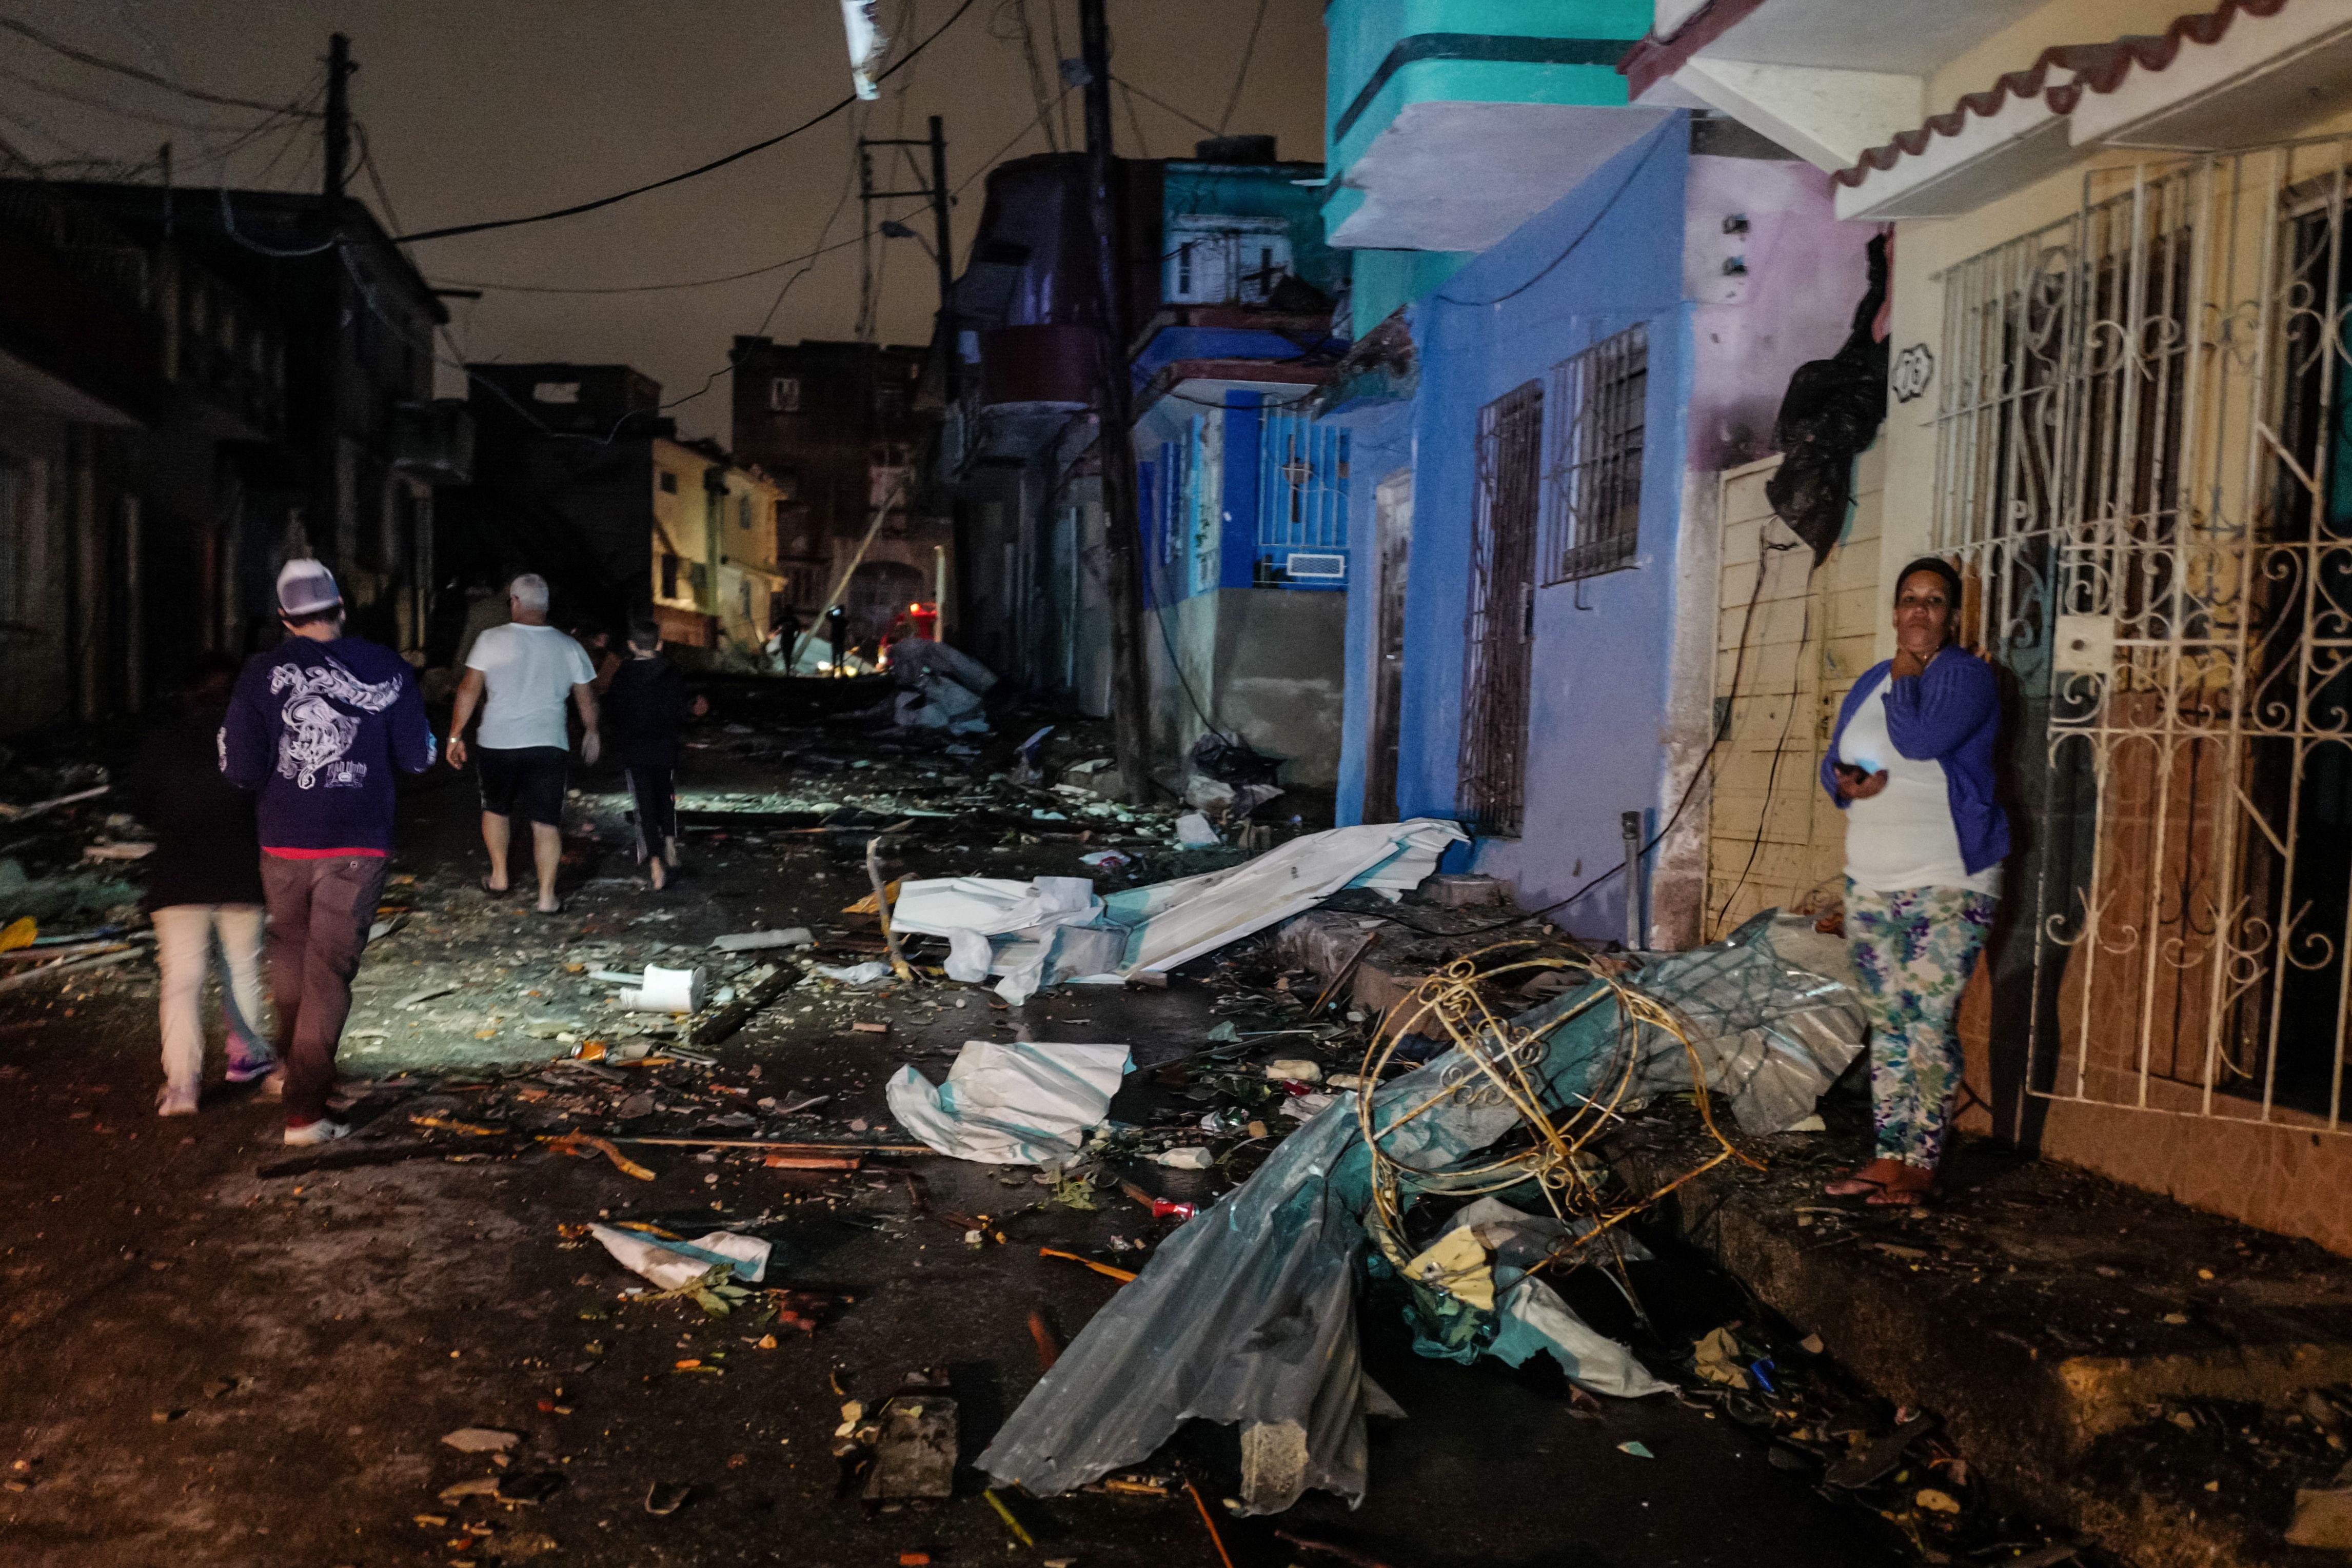 Cubans walk past debris in the tornado-hit Luyano neighbourhood in Havana early on January 28, 2019. (ADALBERTO ROQUE/AFP/Getty Images)